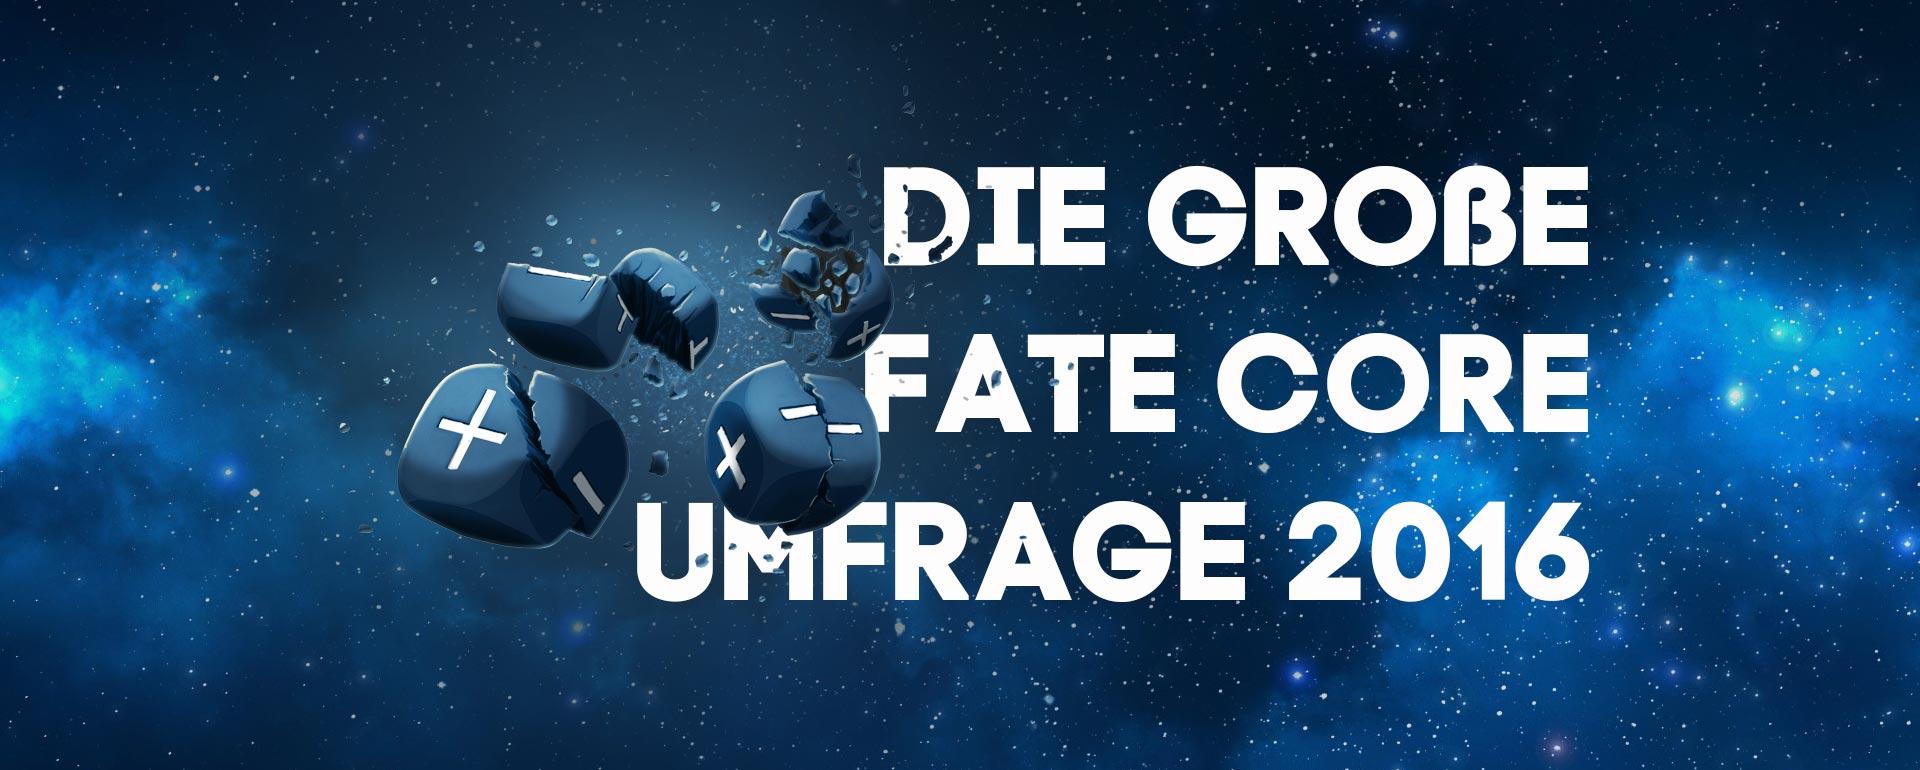 slider-fate-core-umfrage-2016